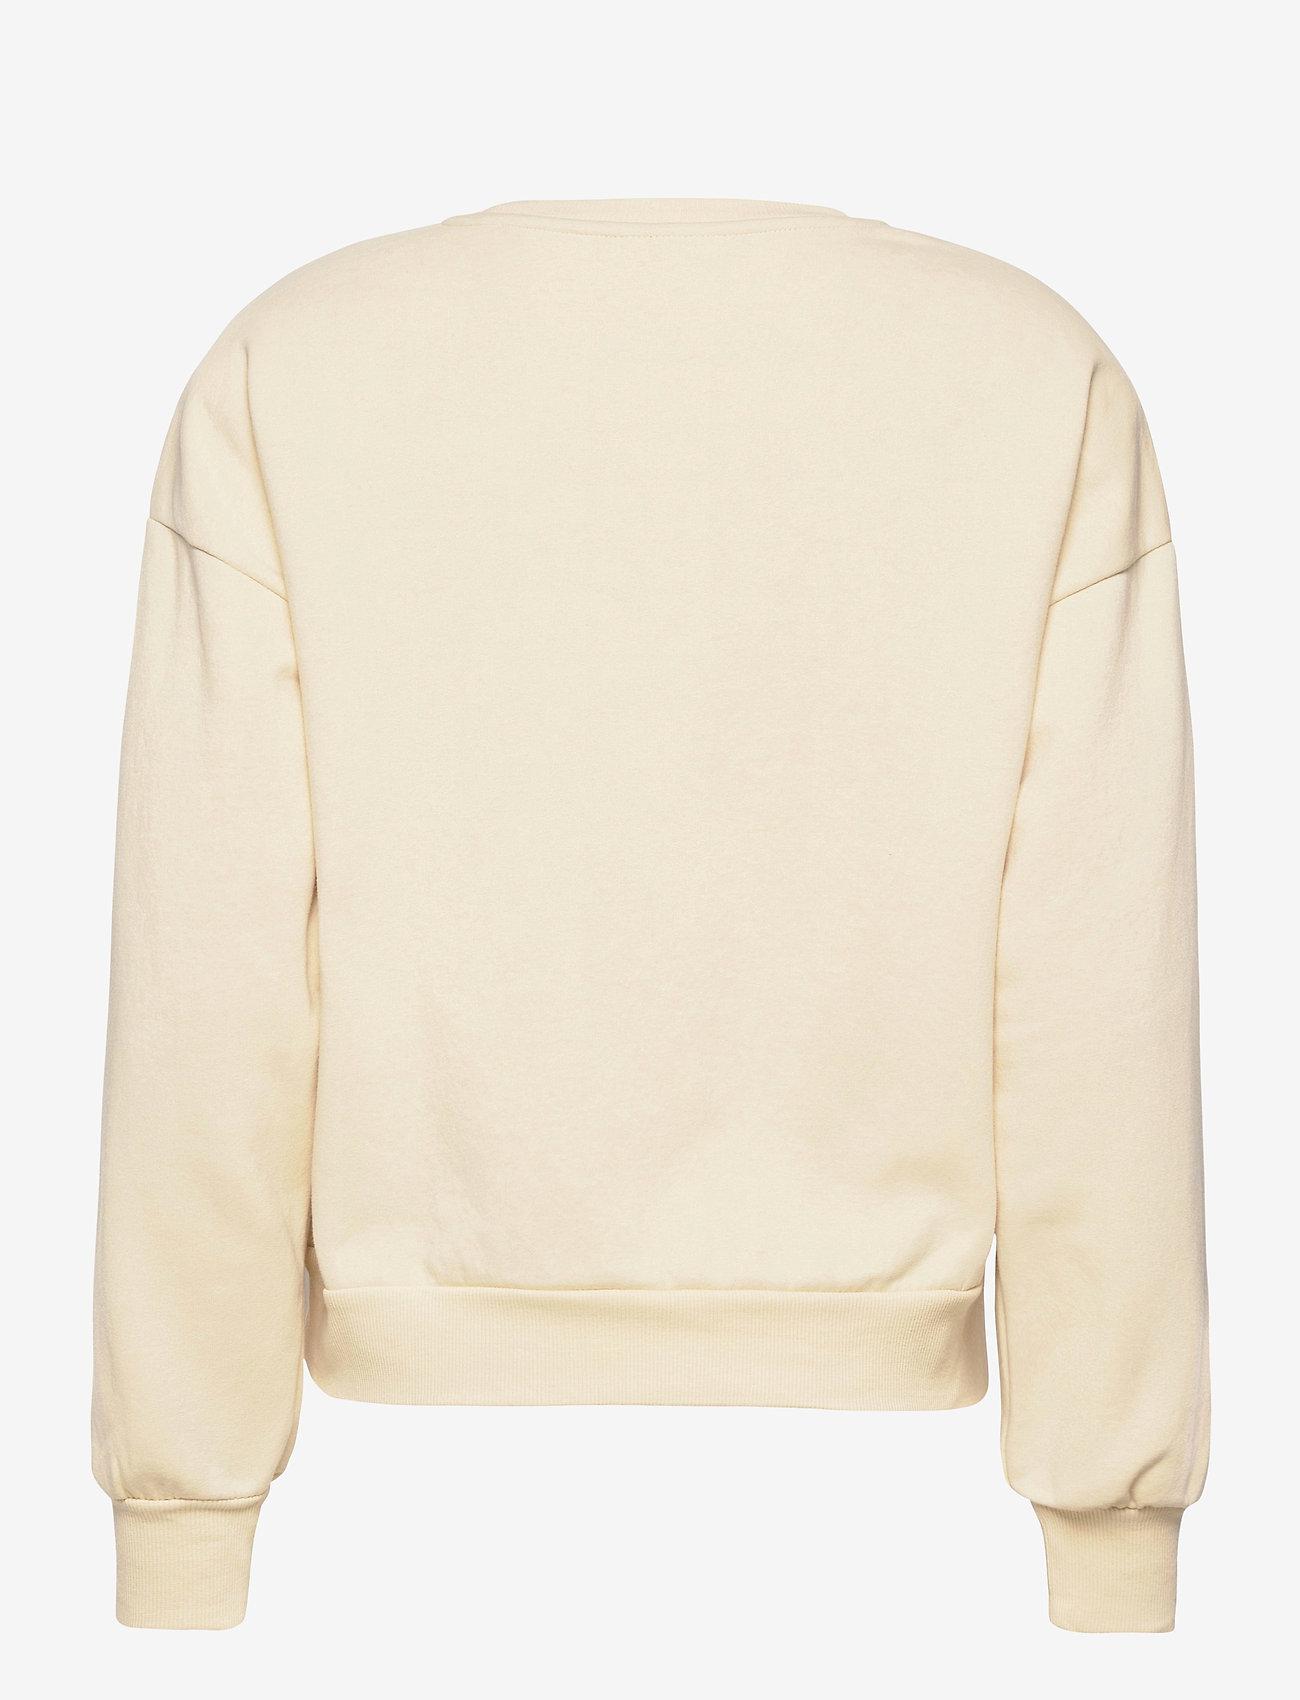 Vero Moda - VMDAISY L/S MUSCLE SWEAT EXP - sweatshirts - creme brle - 1